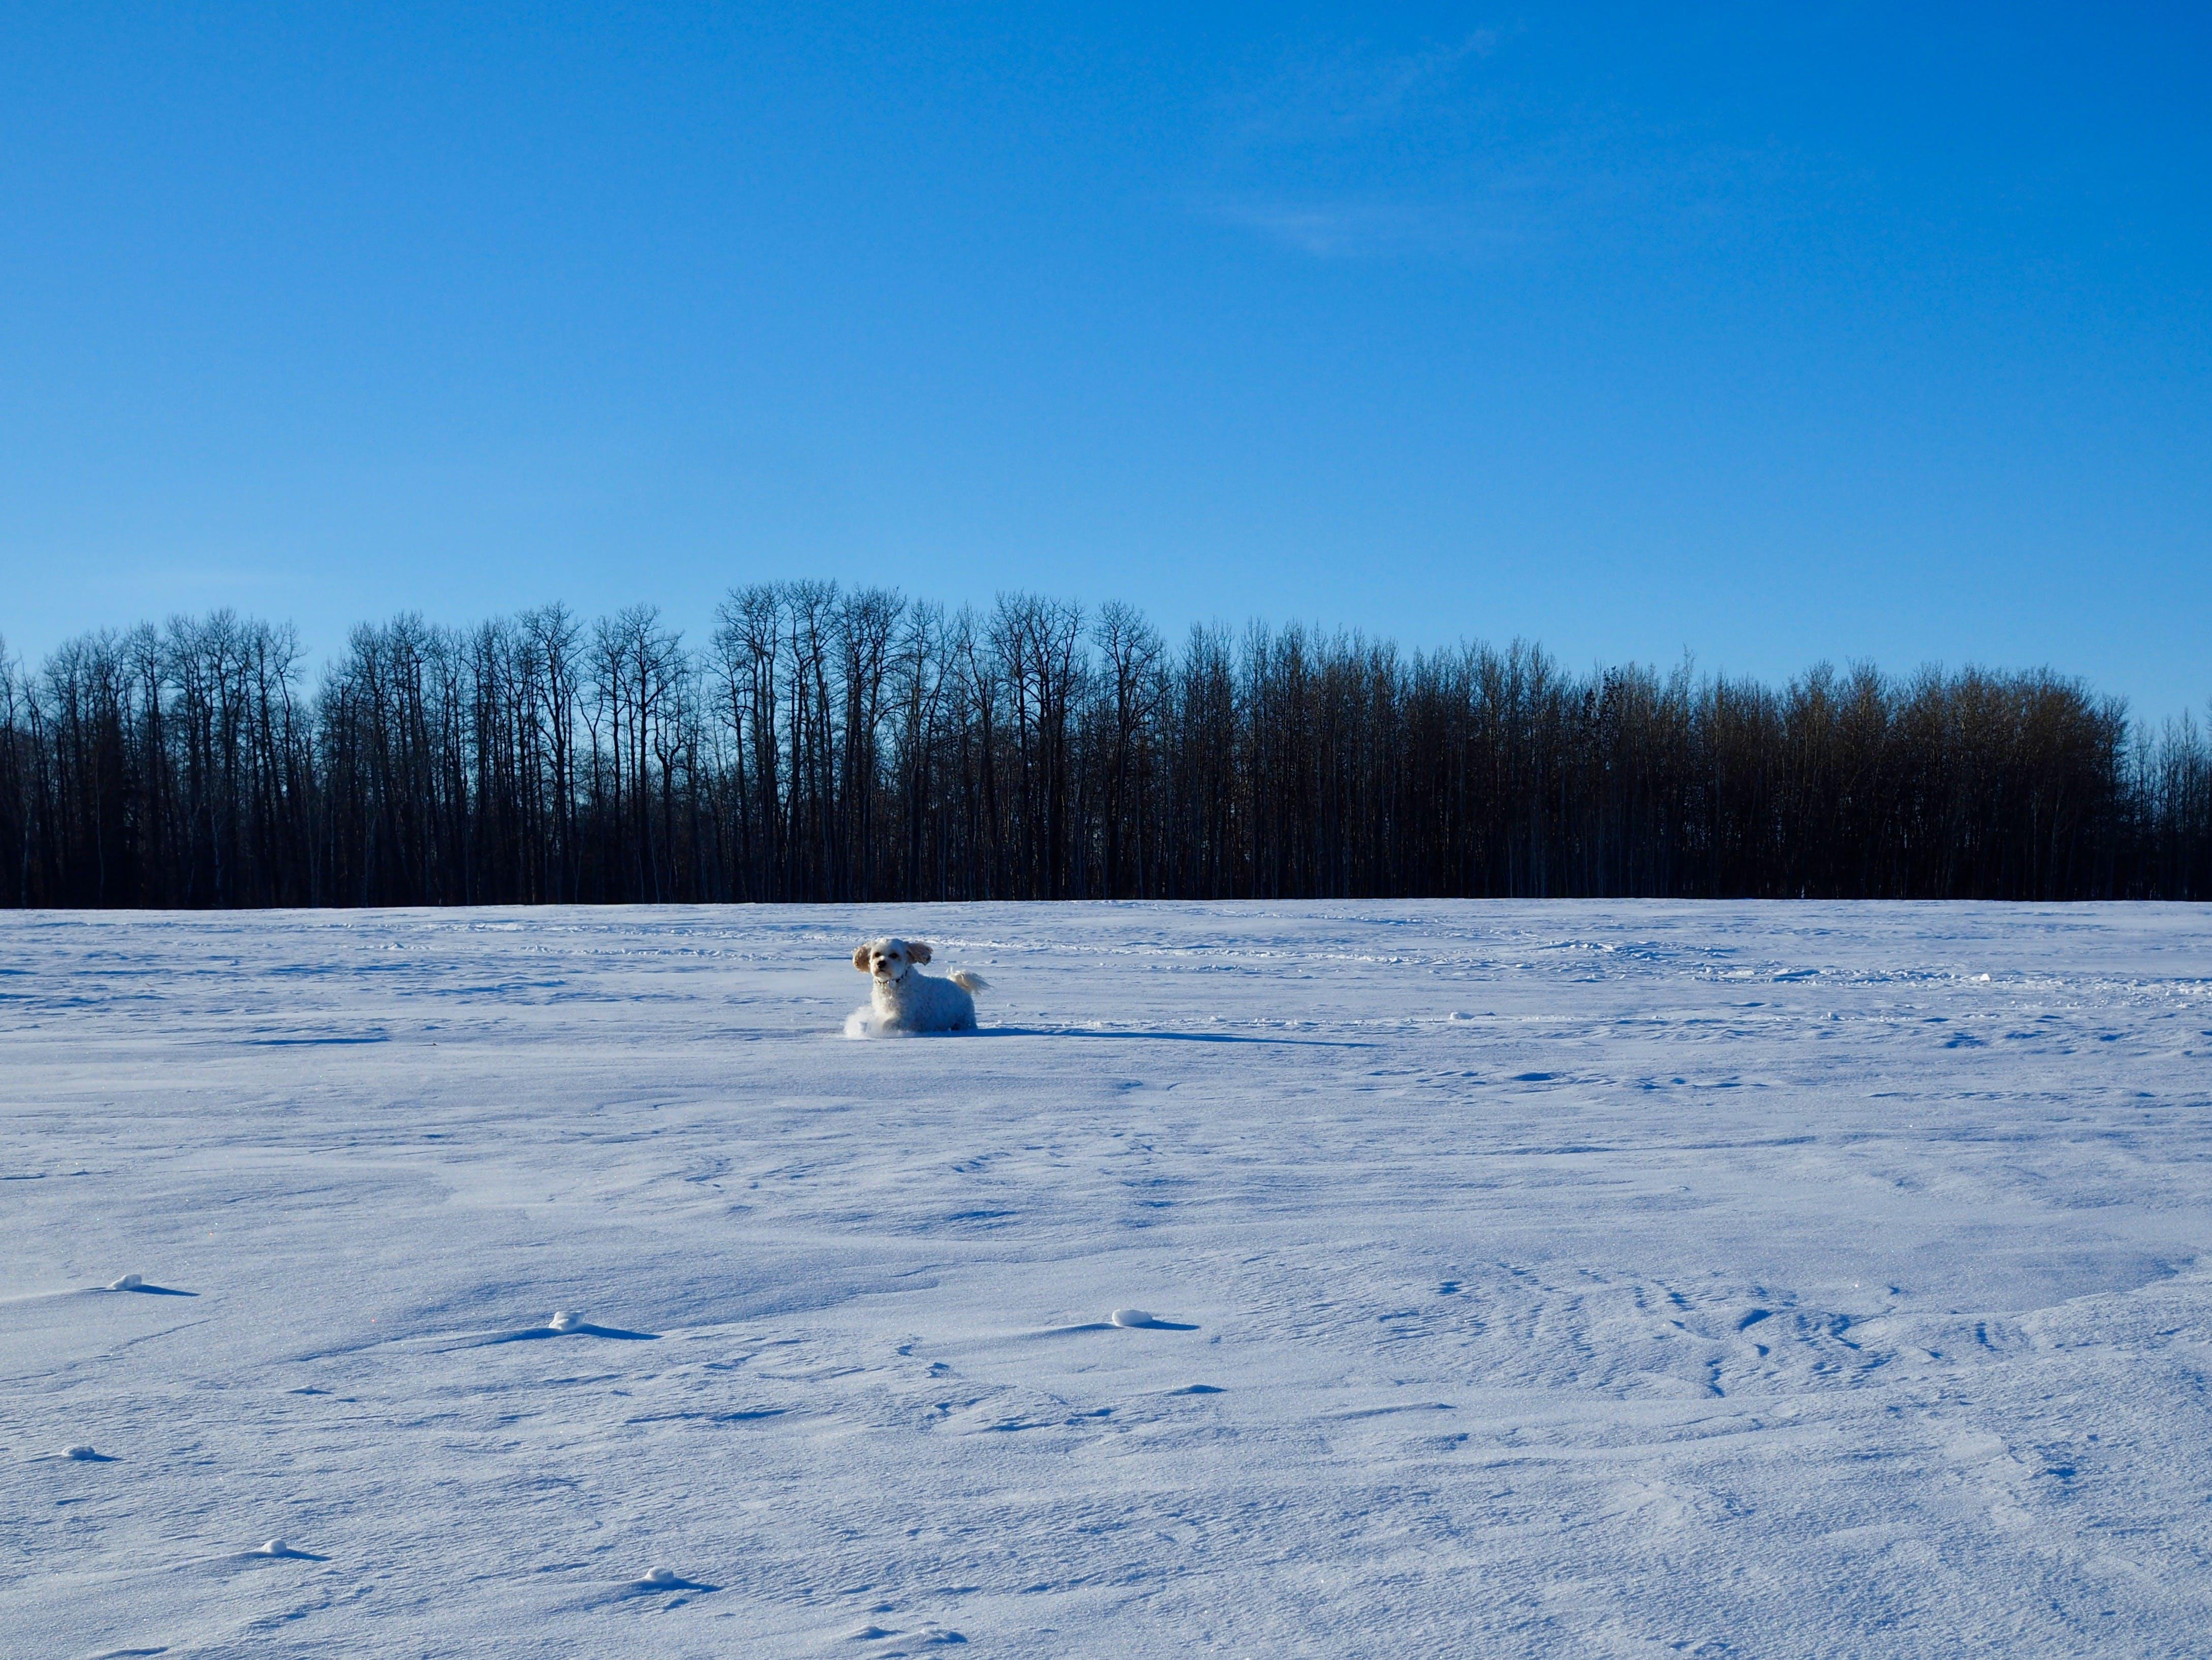 Free stock photo of Bijon, blue sky, snow, winter landscape